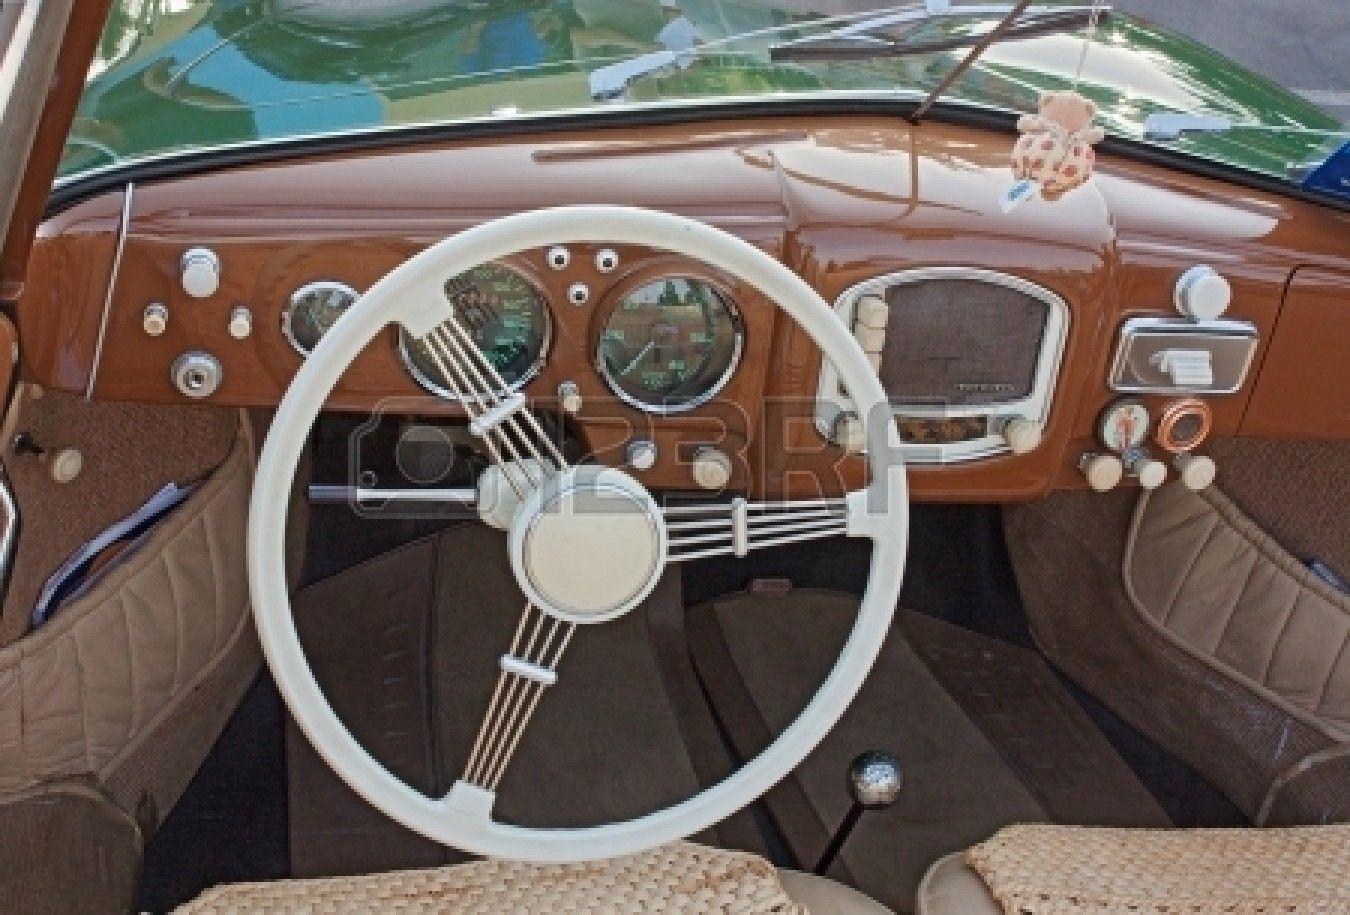 old car dashboard design - Google Search   Vintage Dashboard ...